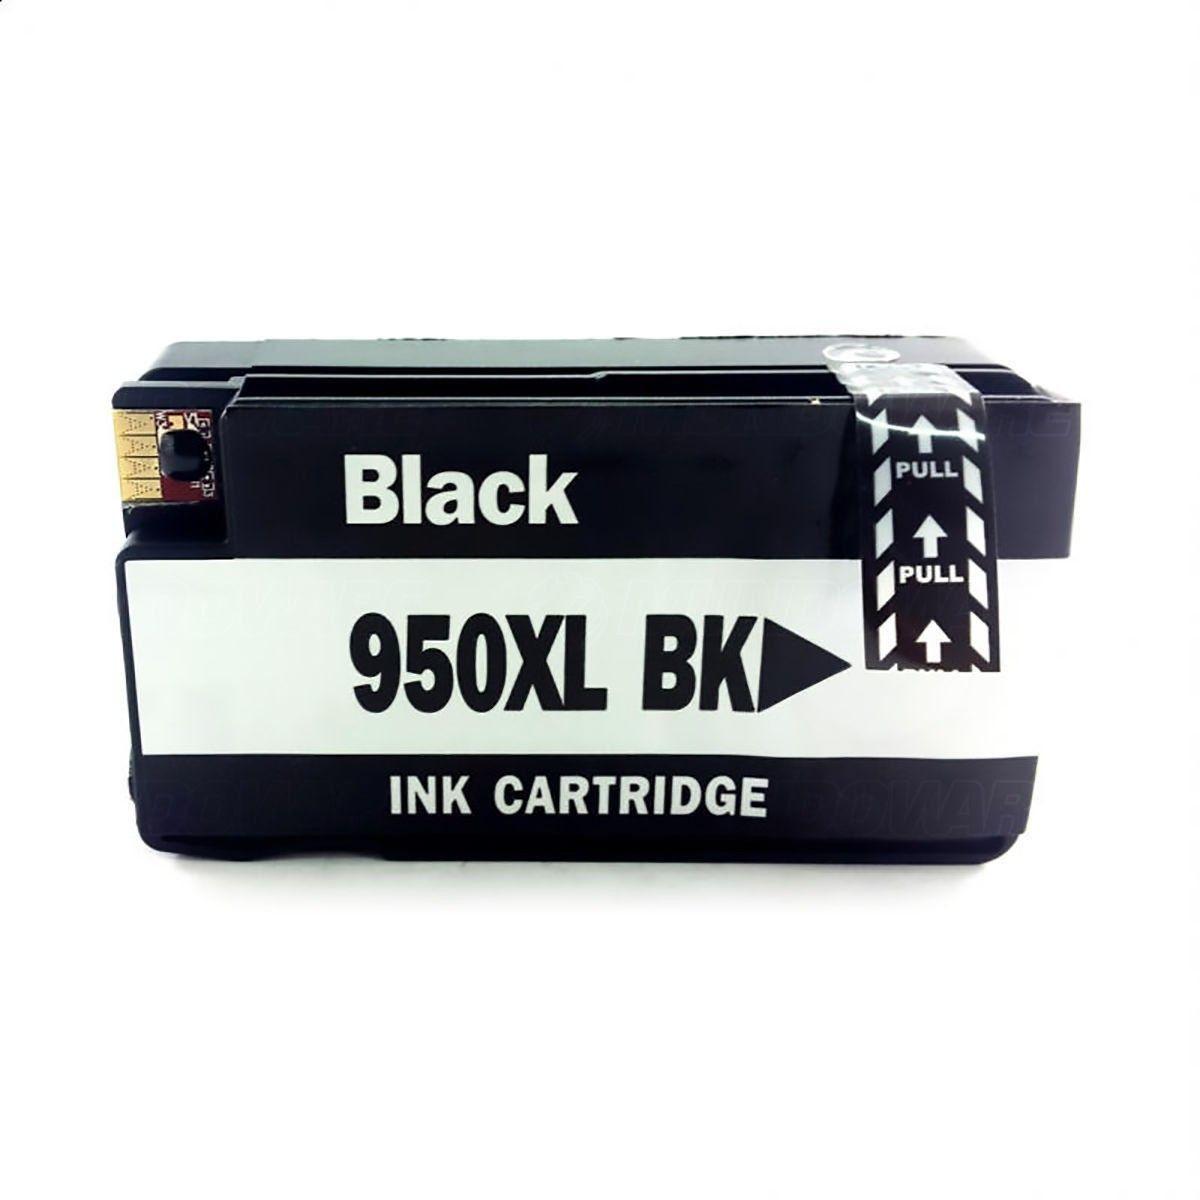 Compatível: Cartucho de Tinta 950xl 950 para Impressora HP Pro 8600 8600w 8100 8620 8610 251dw N811 / Preto / 74ml